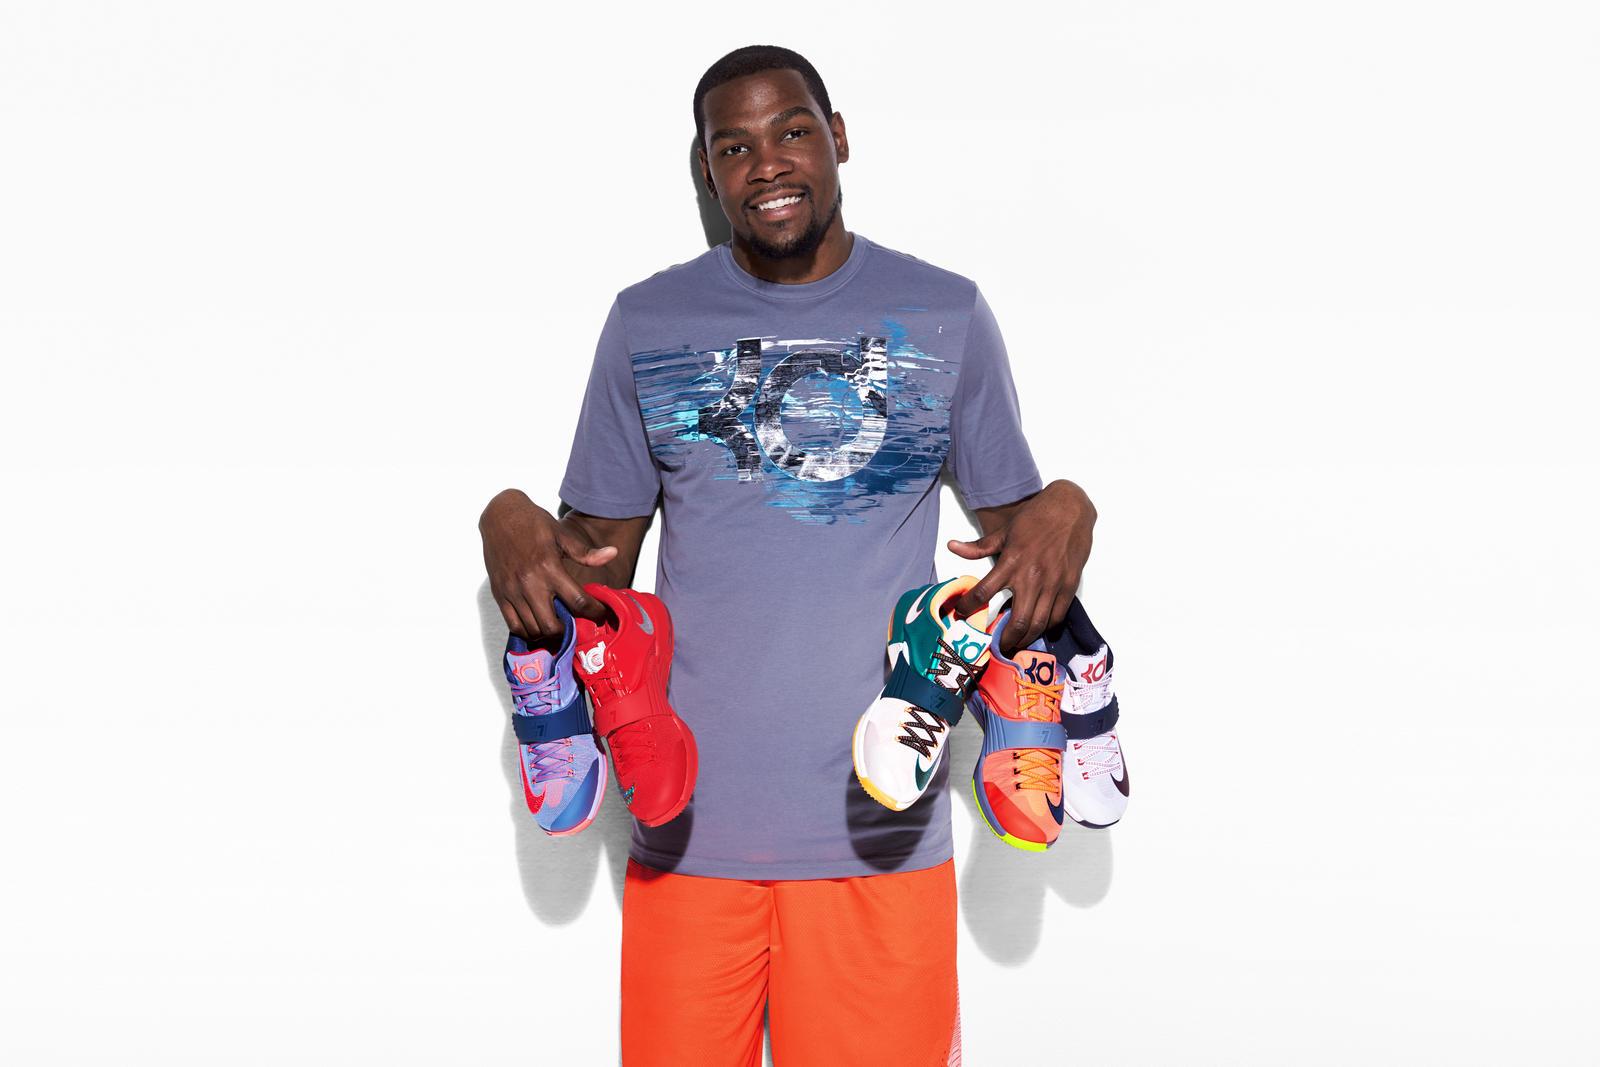 kd 7 shoe